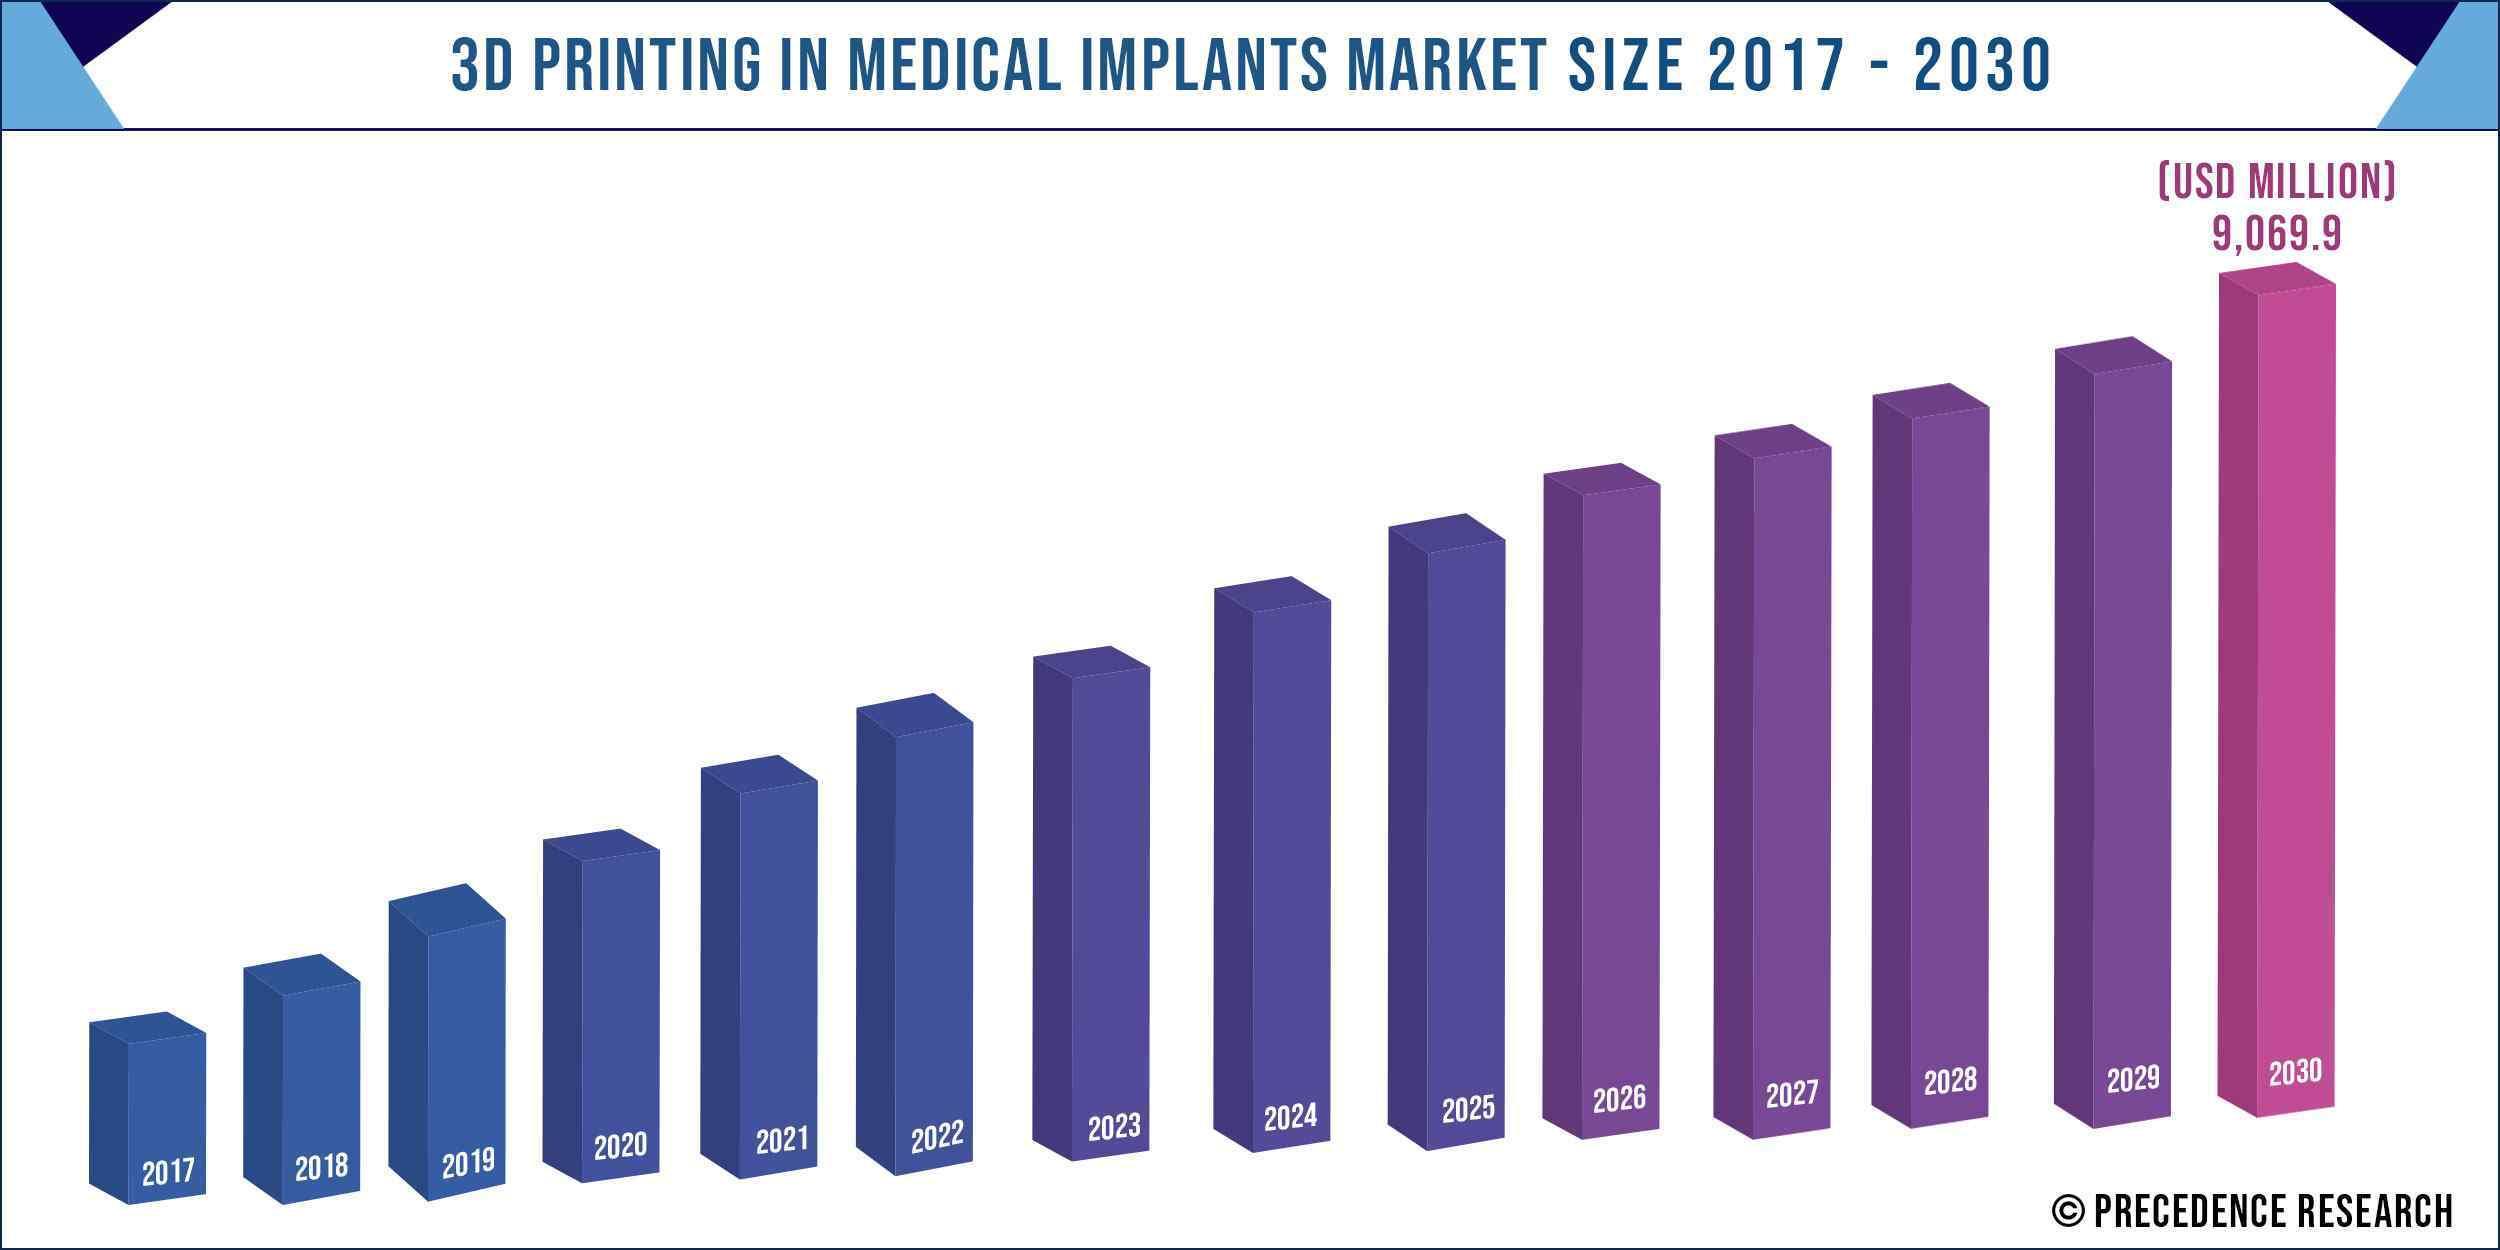 3D Printing Medical Implants Market Size 2017-2030